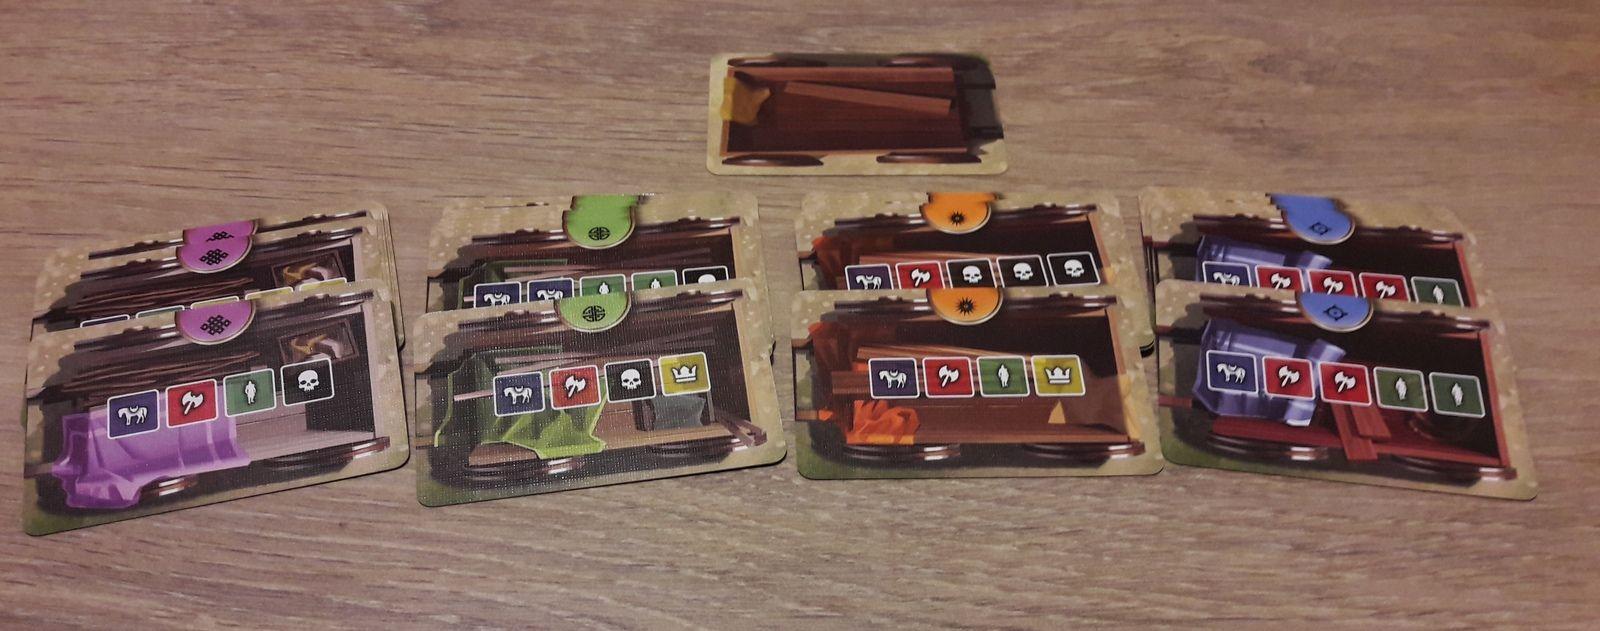 4 type de chariots : mauve, vert , orange, bleu